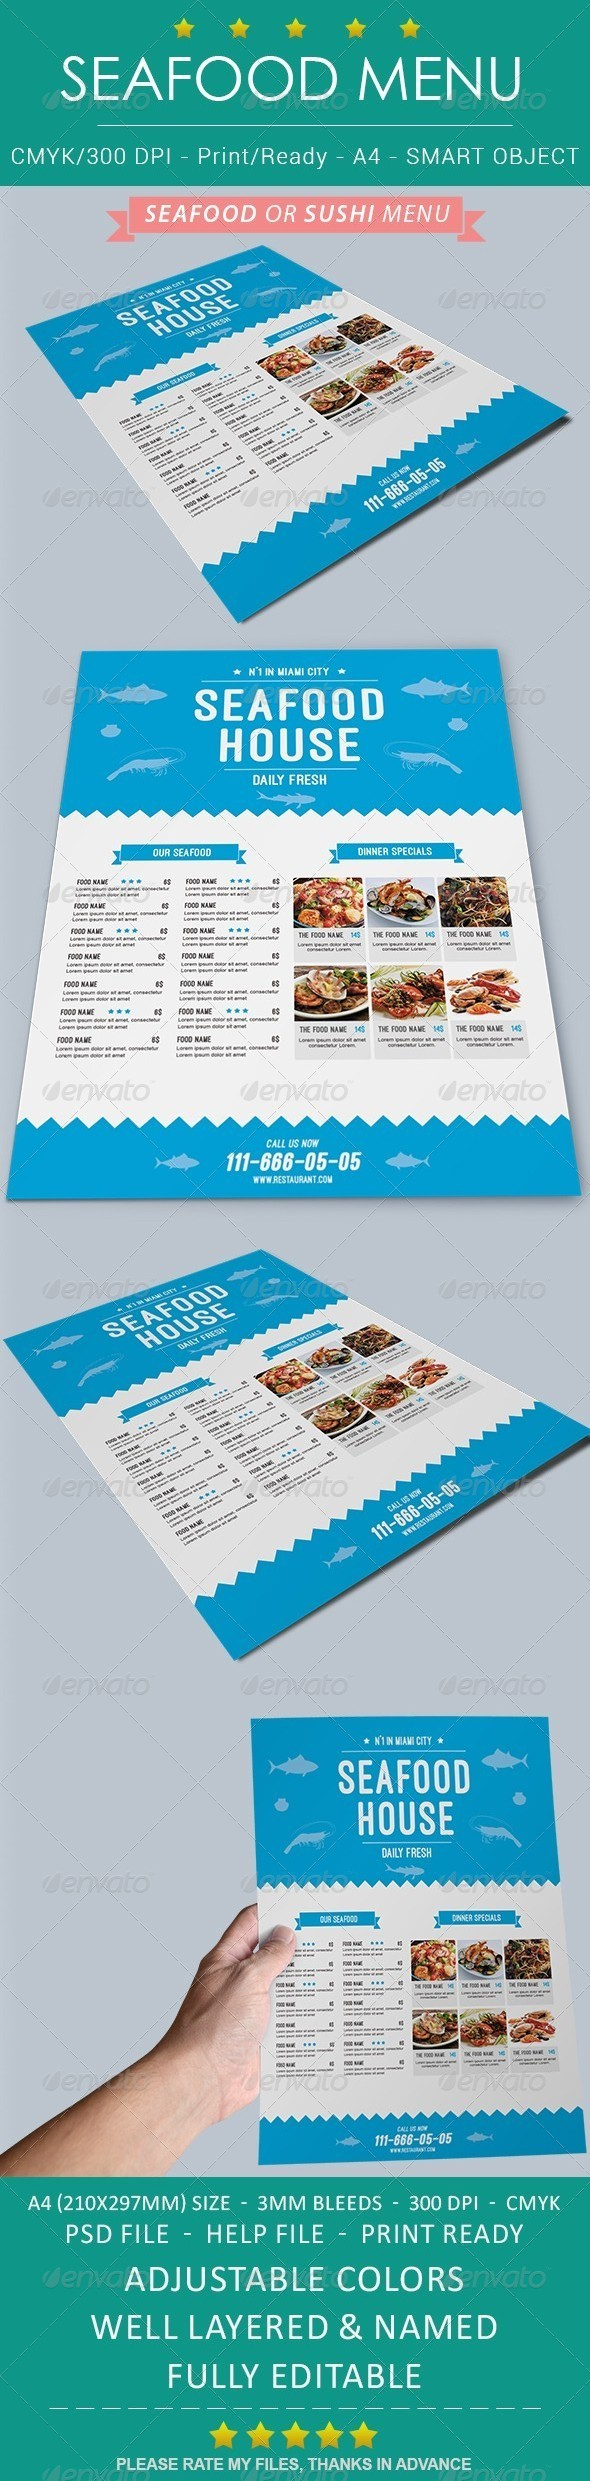 Seafood Sushi Restaurant Menu